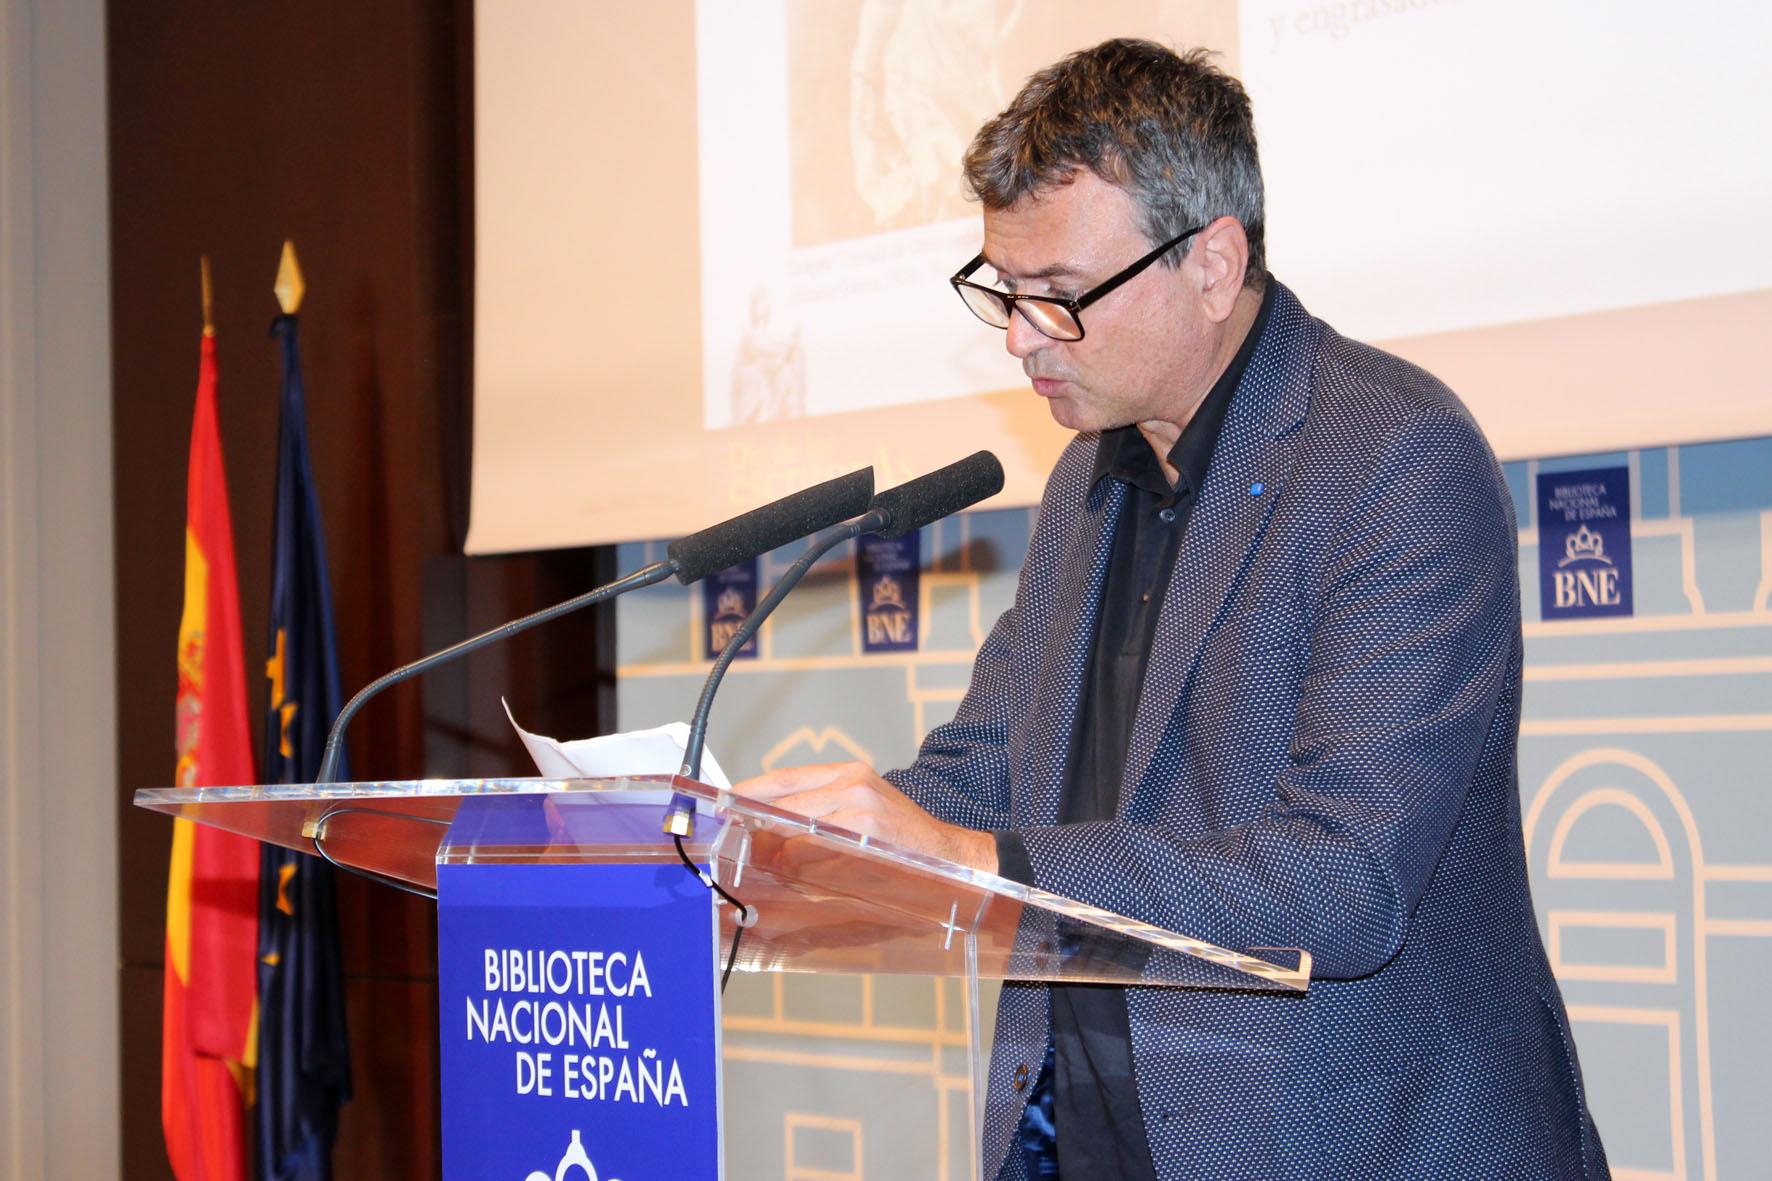 2016 Ernesto Caballero